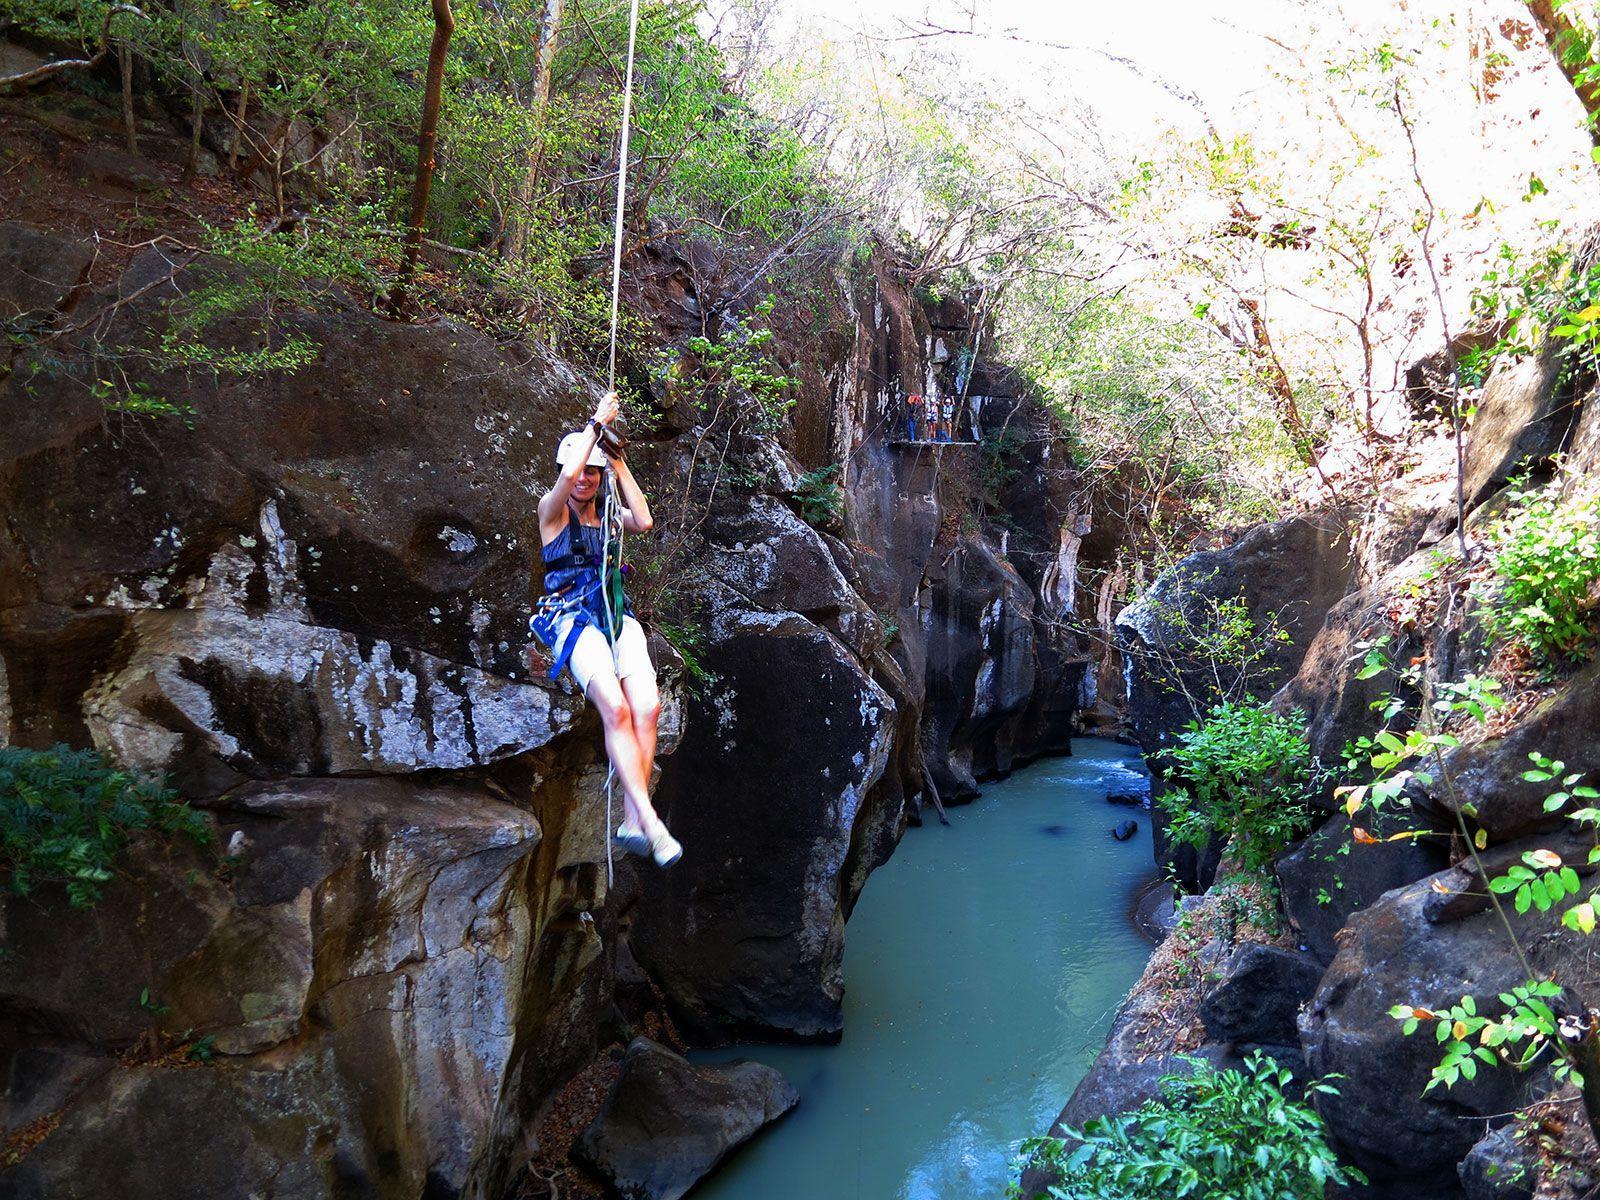 /wp-content/uploads/itineraries/Costa-Rica/rio-perdido-river-1.jpg